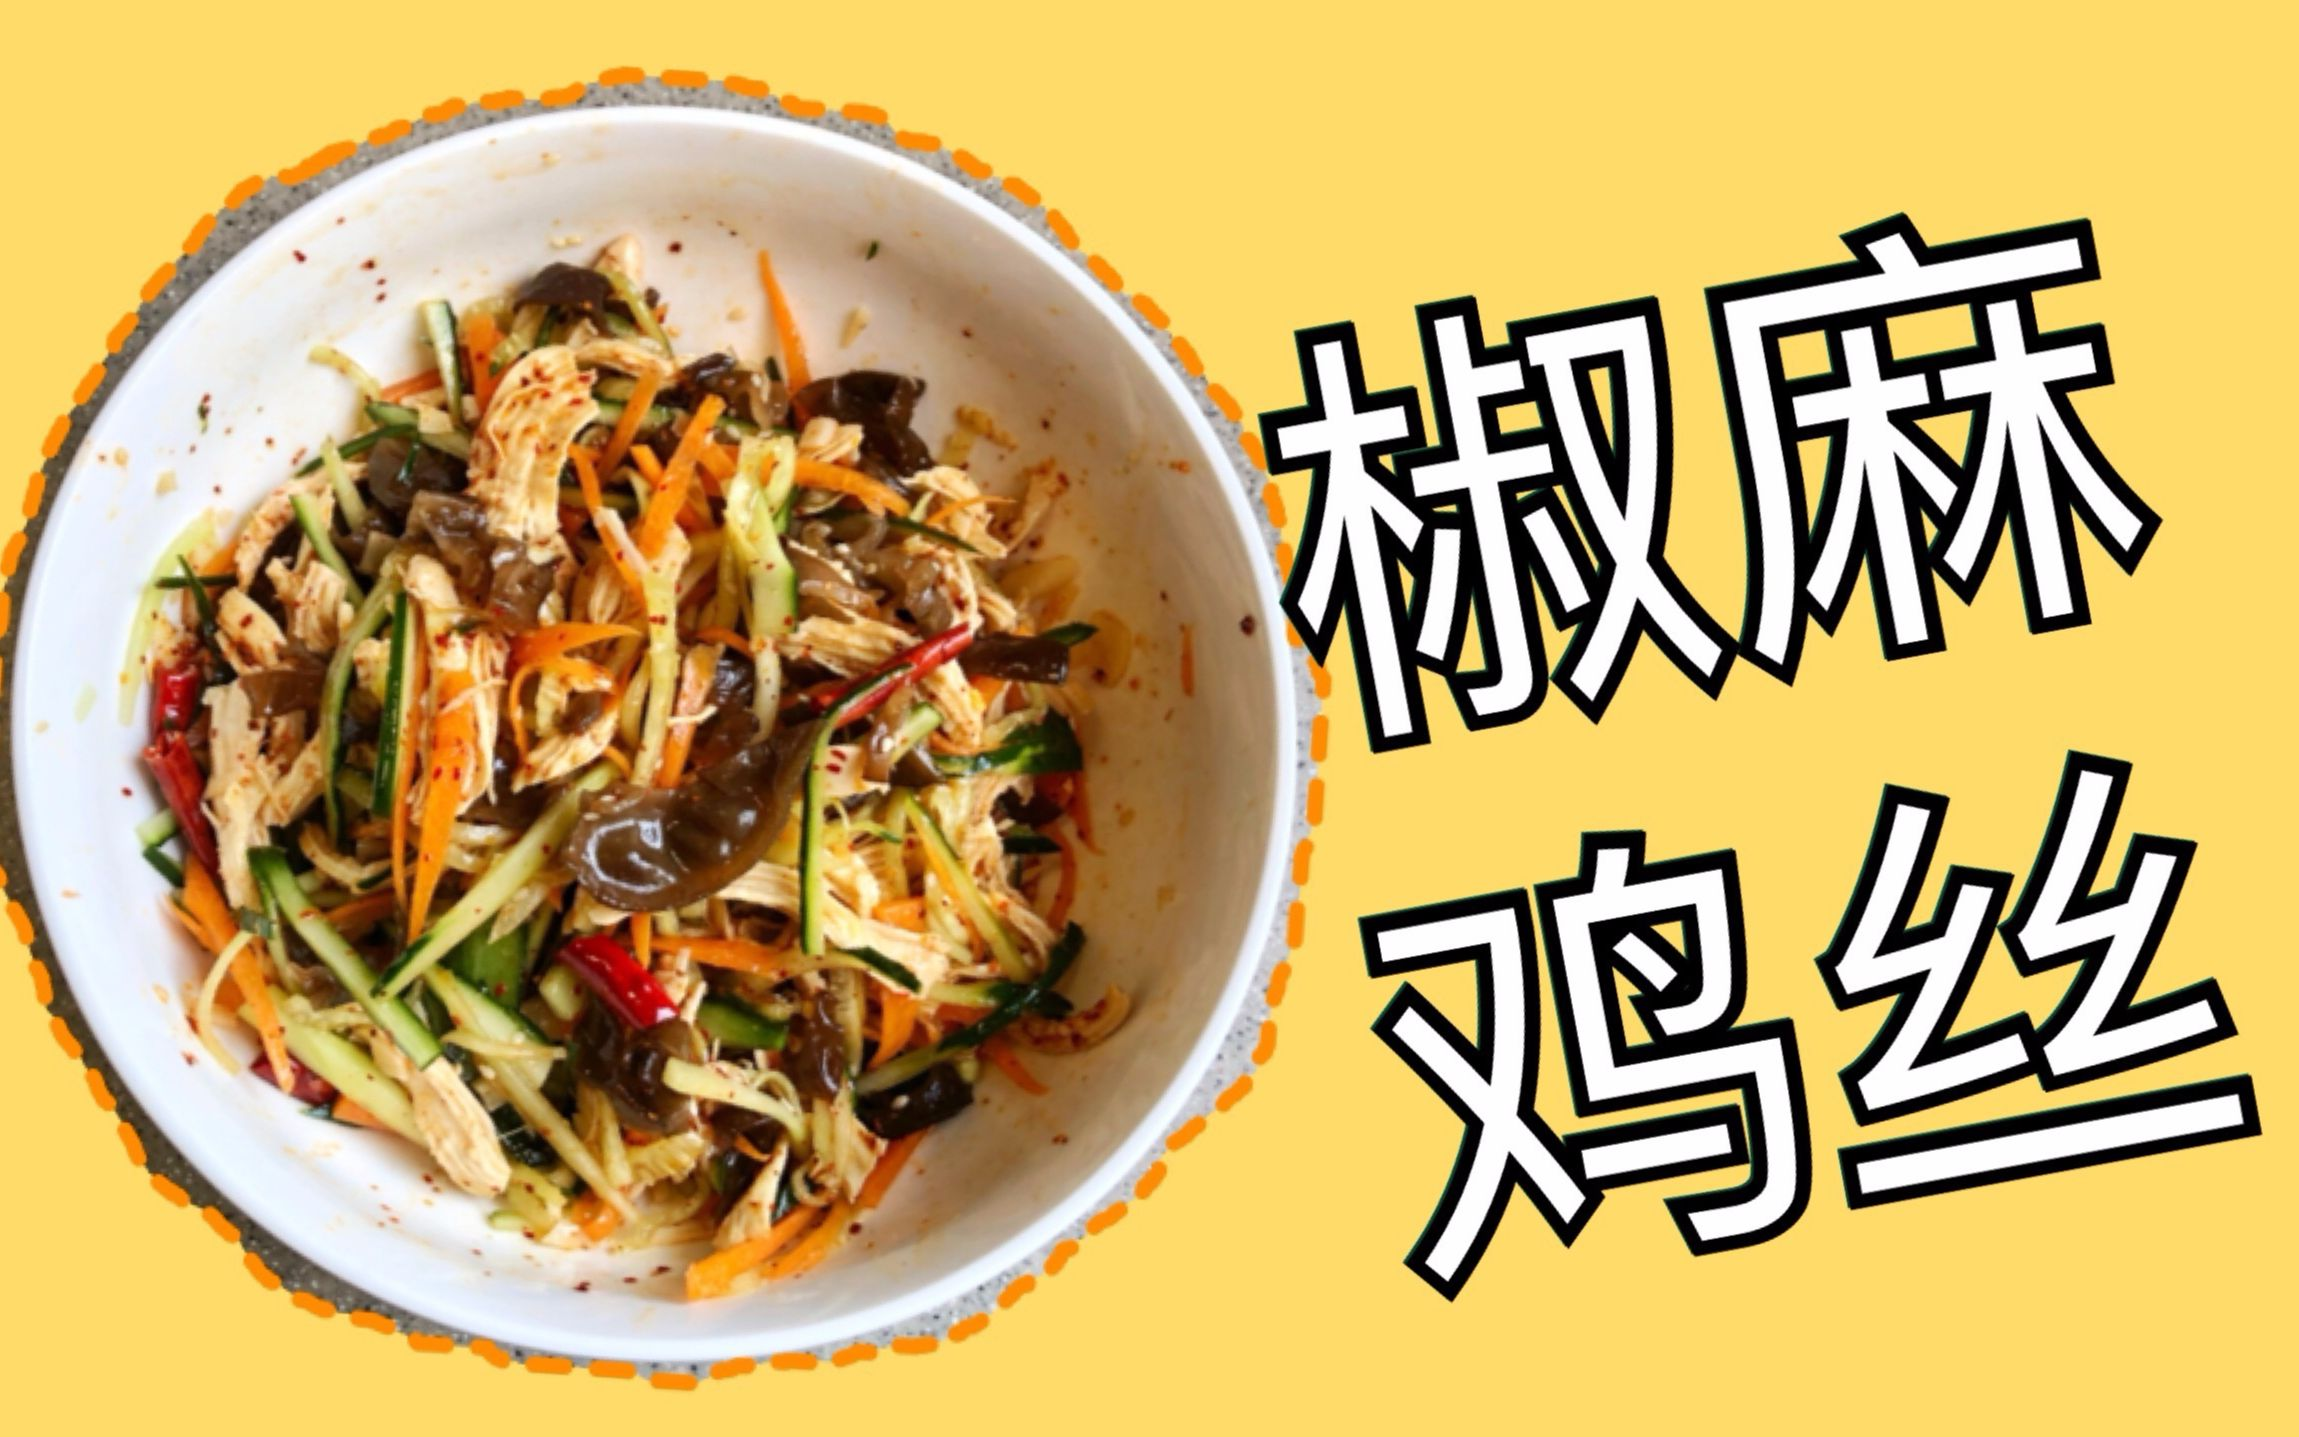 Evian)椒 麻 鸡 丝 鸡 胸 肉 竟 然 还 能 这 么 吃. 夏 日 爽 口 凉 拌 菜 哔 哩 哔 哩 (`-